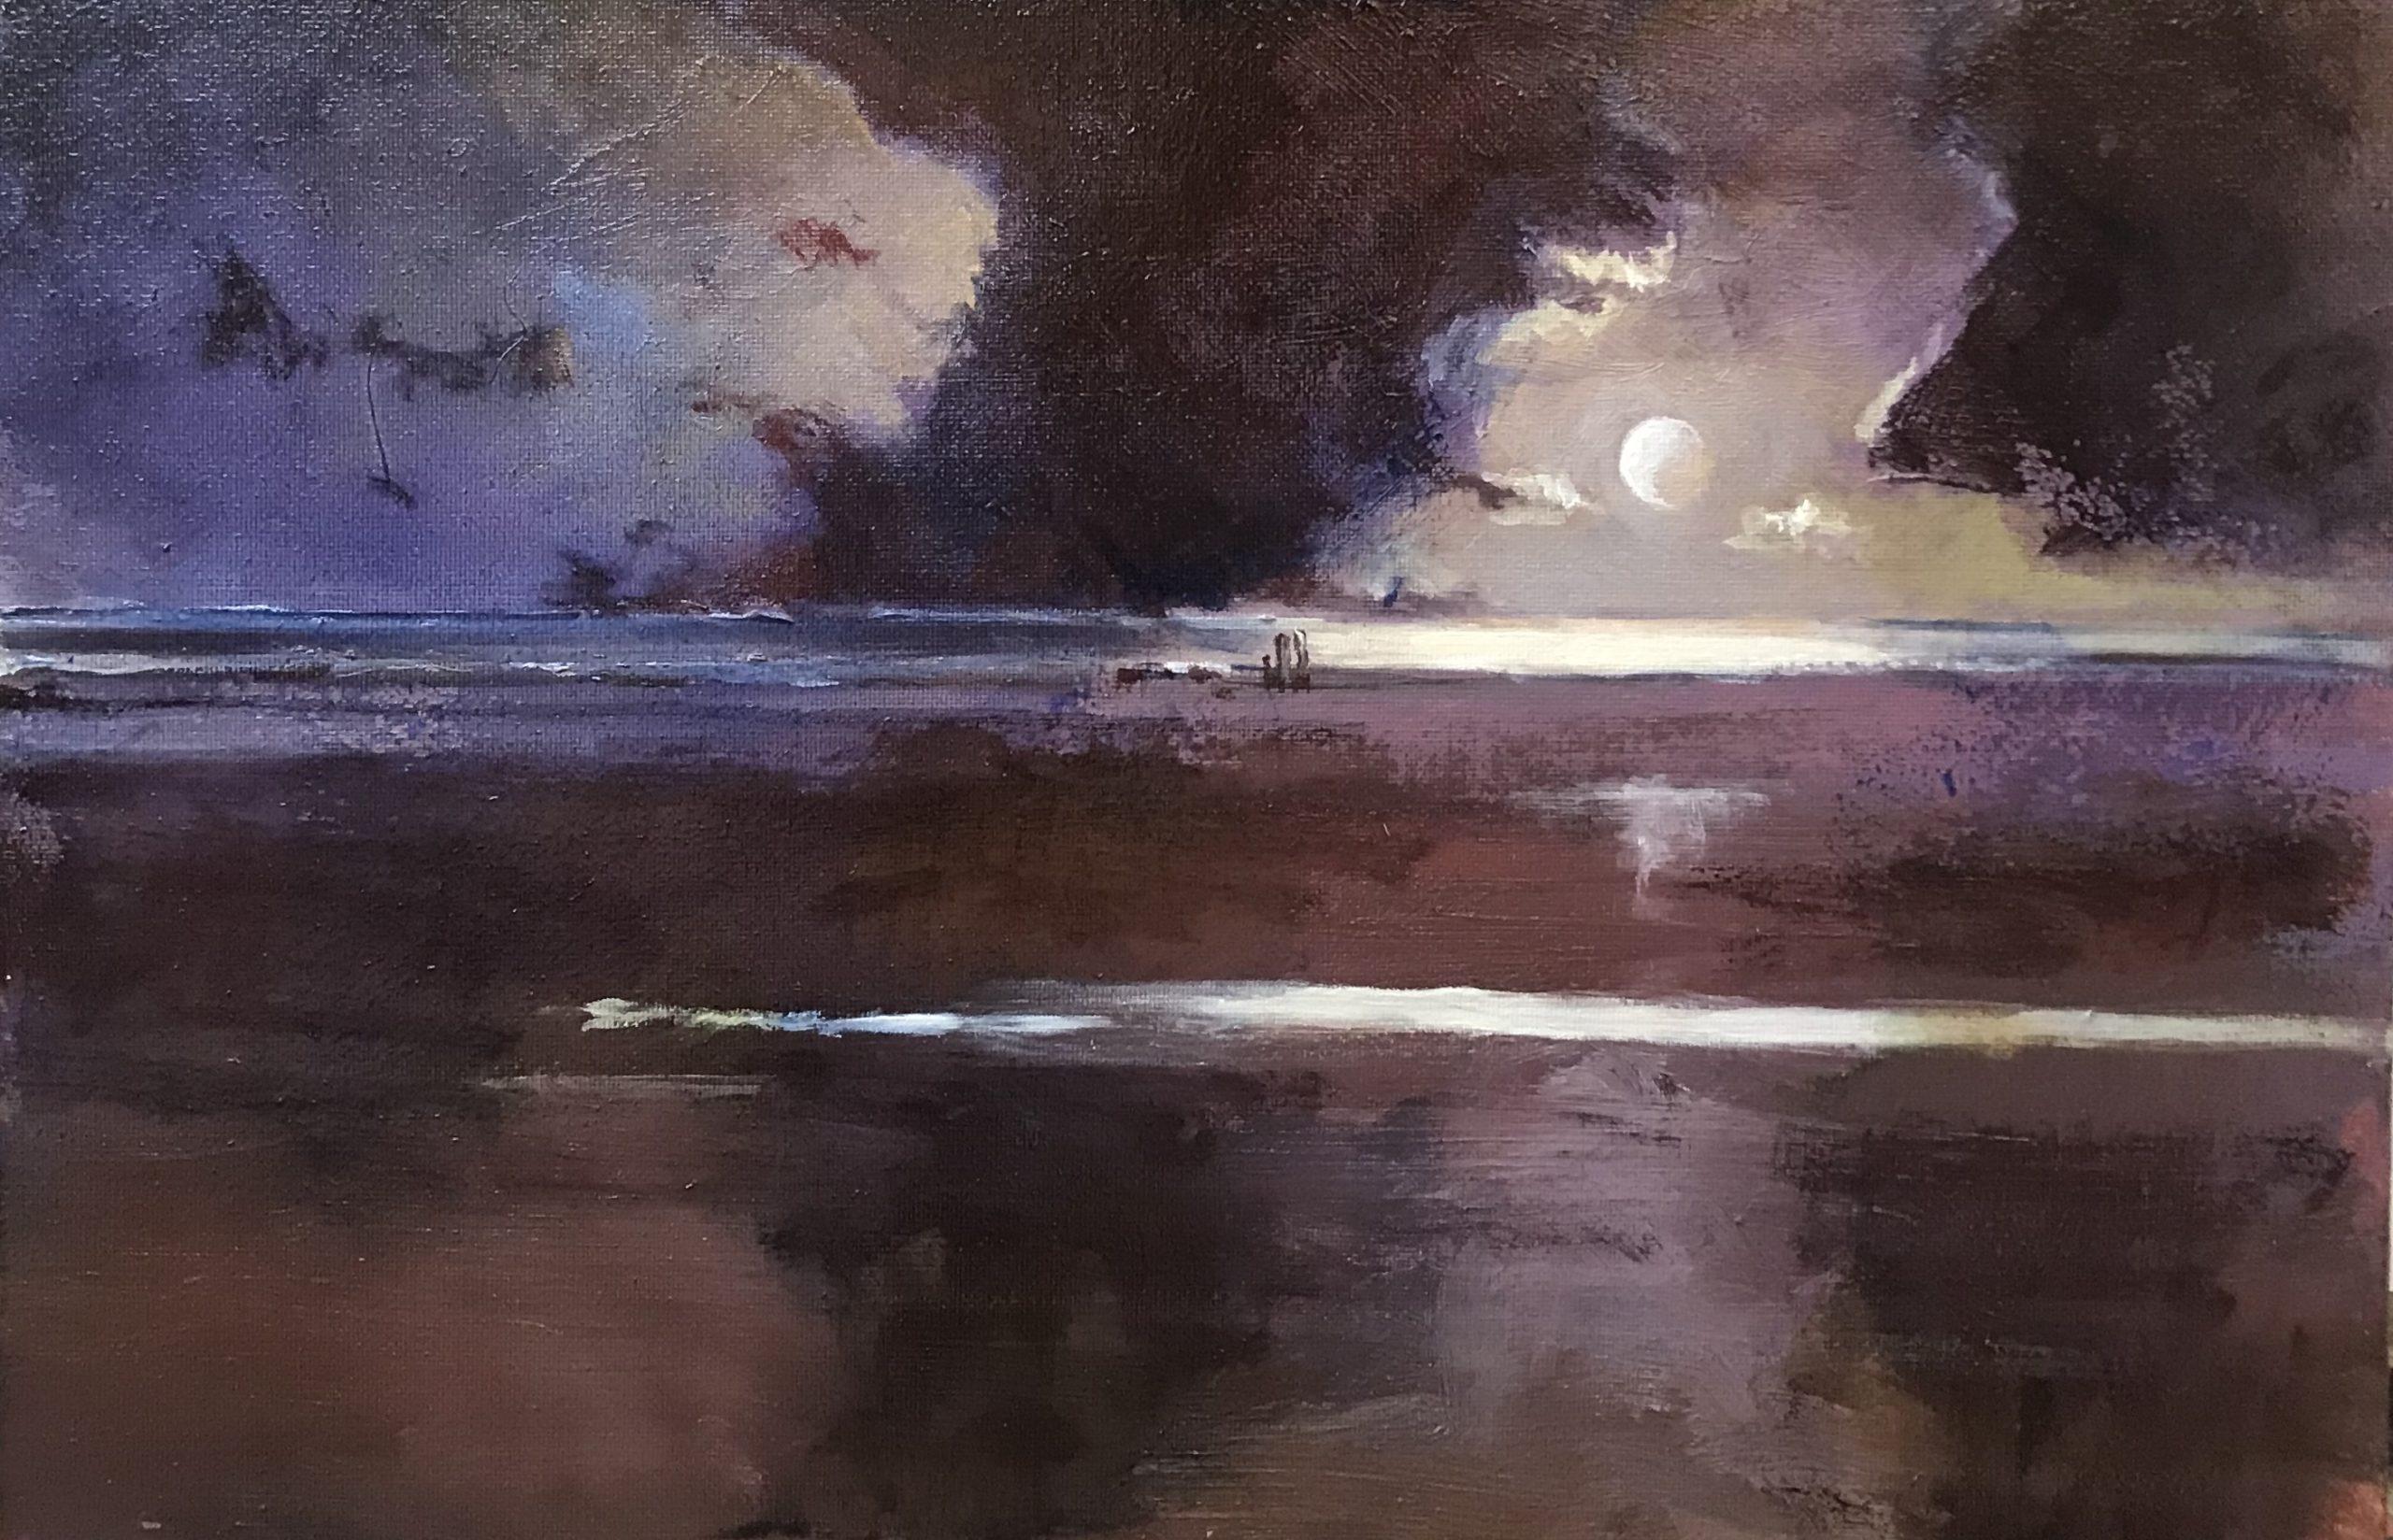 Full Moon over the beach at Aberdyfi